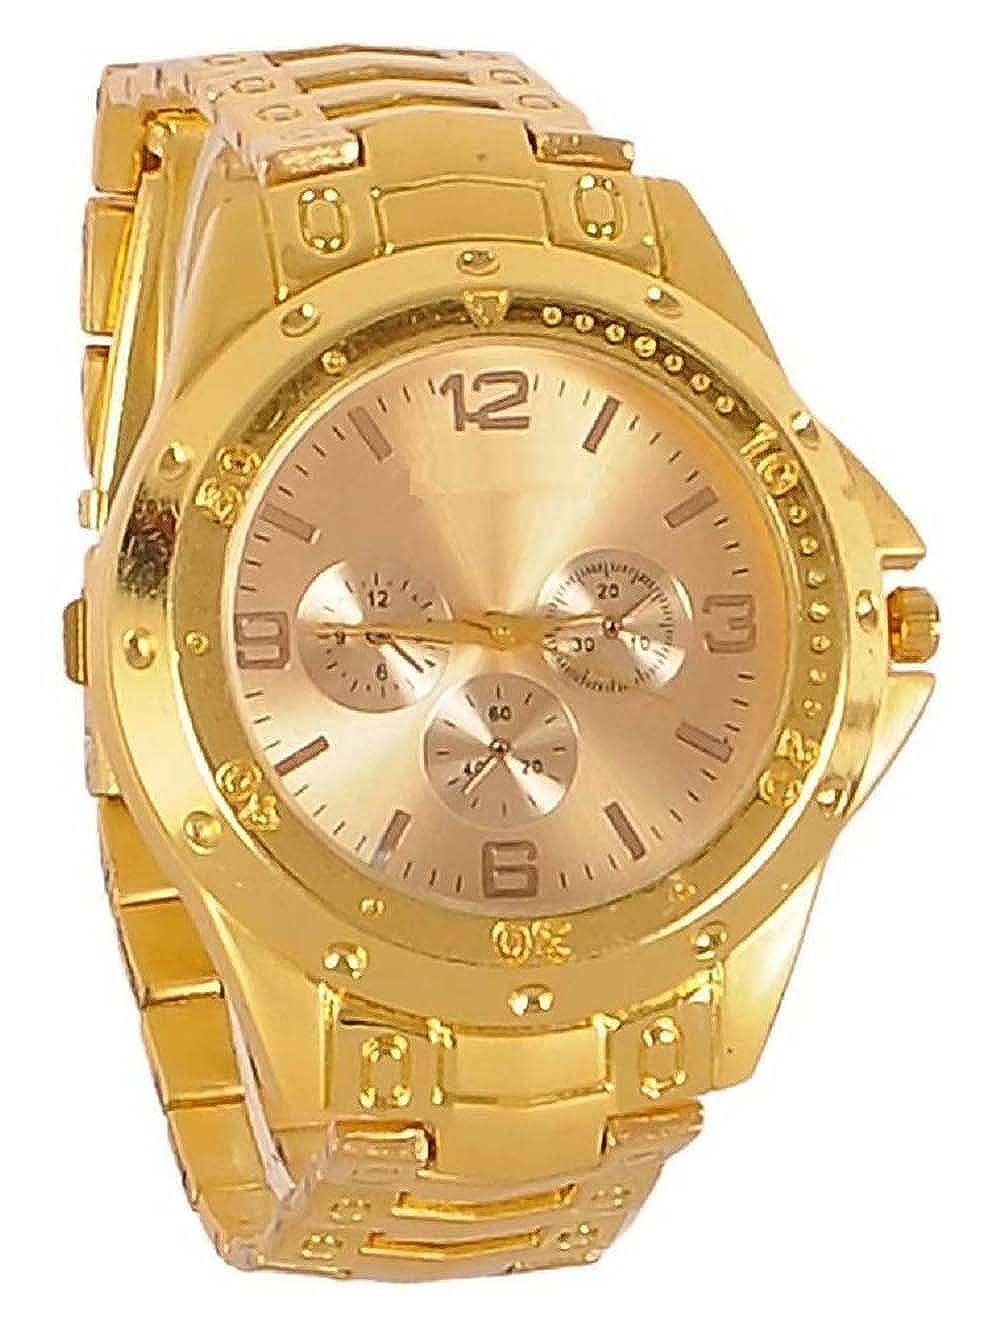 2019 year for lady- Stylish rosra analog silver metal wrist watch